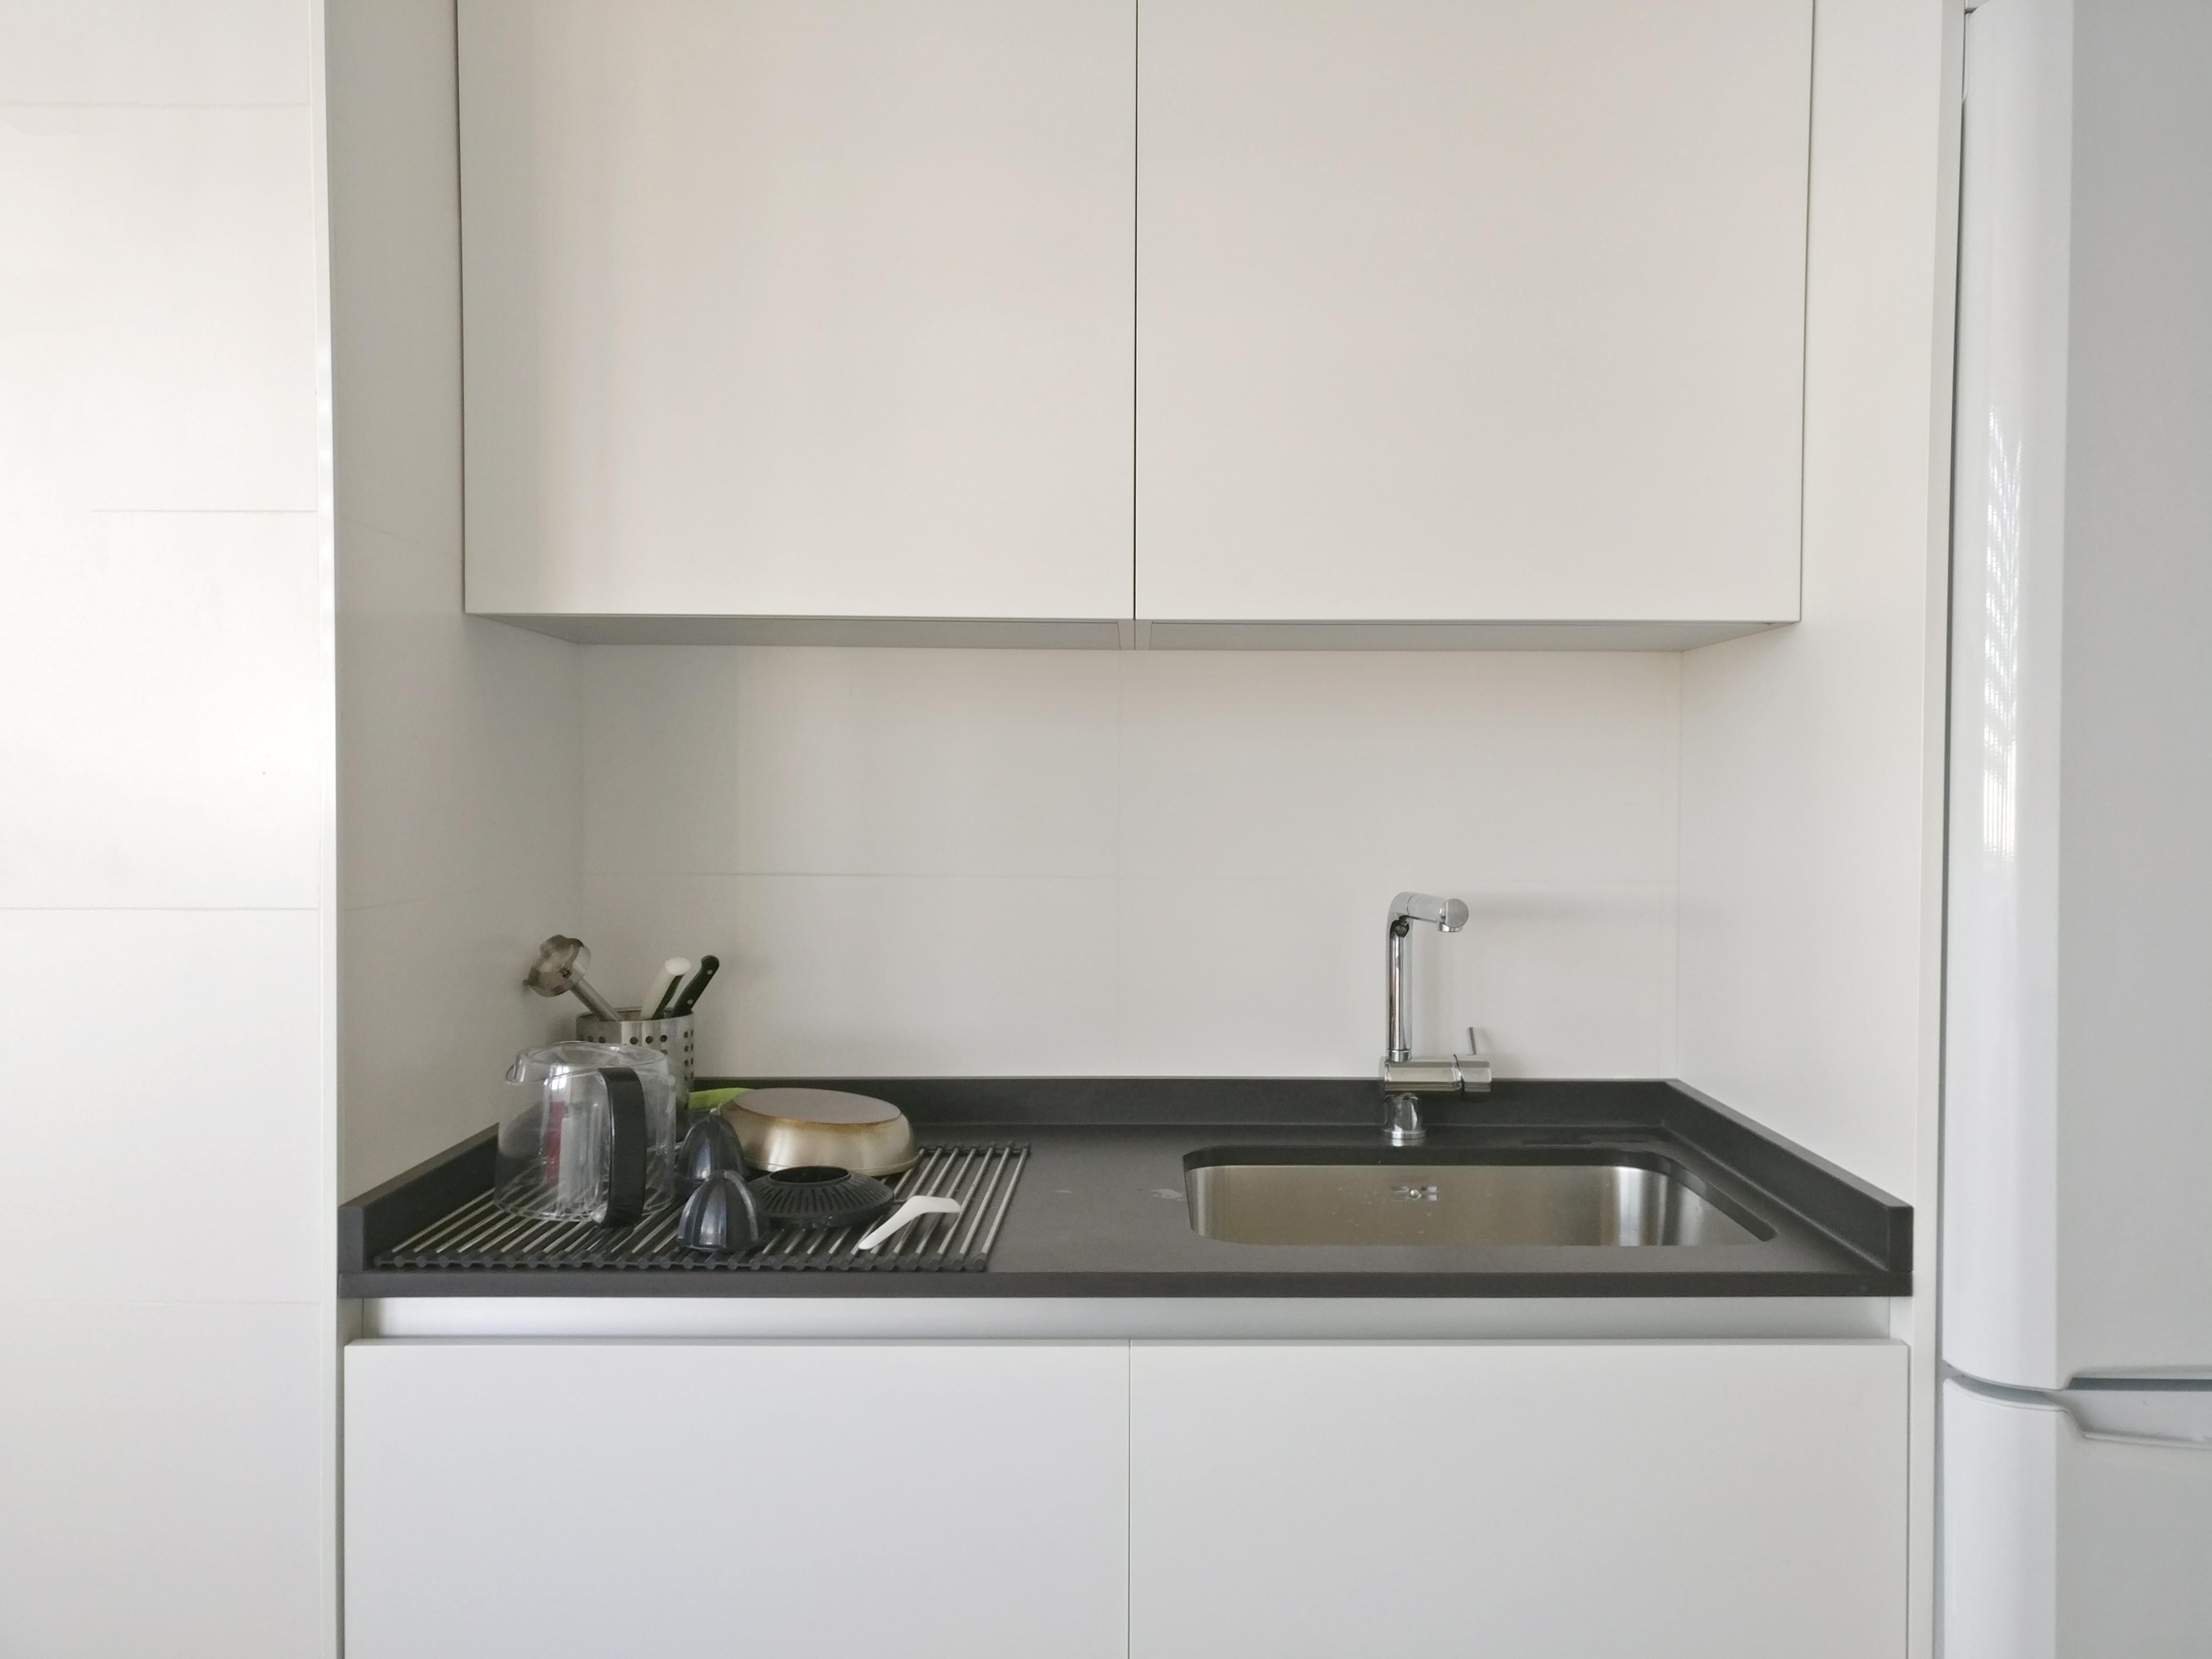 reforma vivienda 90m2 cocina3